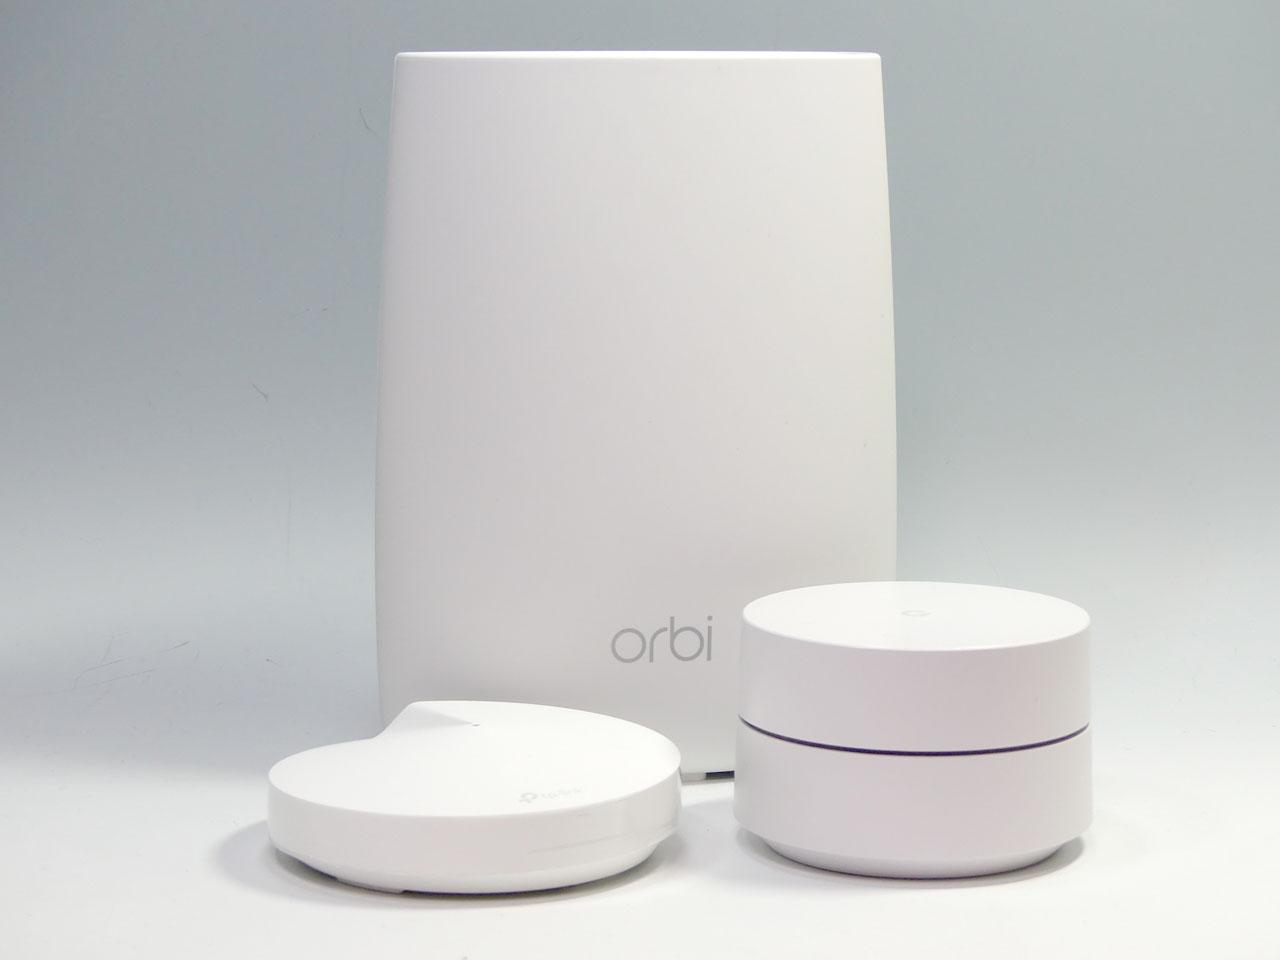 「Google Wifi」(右)、NETGEAR「Orbi」(中央)、TP-Link「Deco M5」(左)